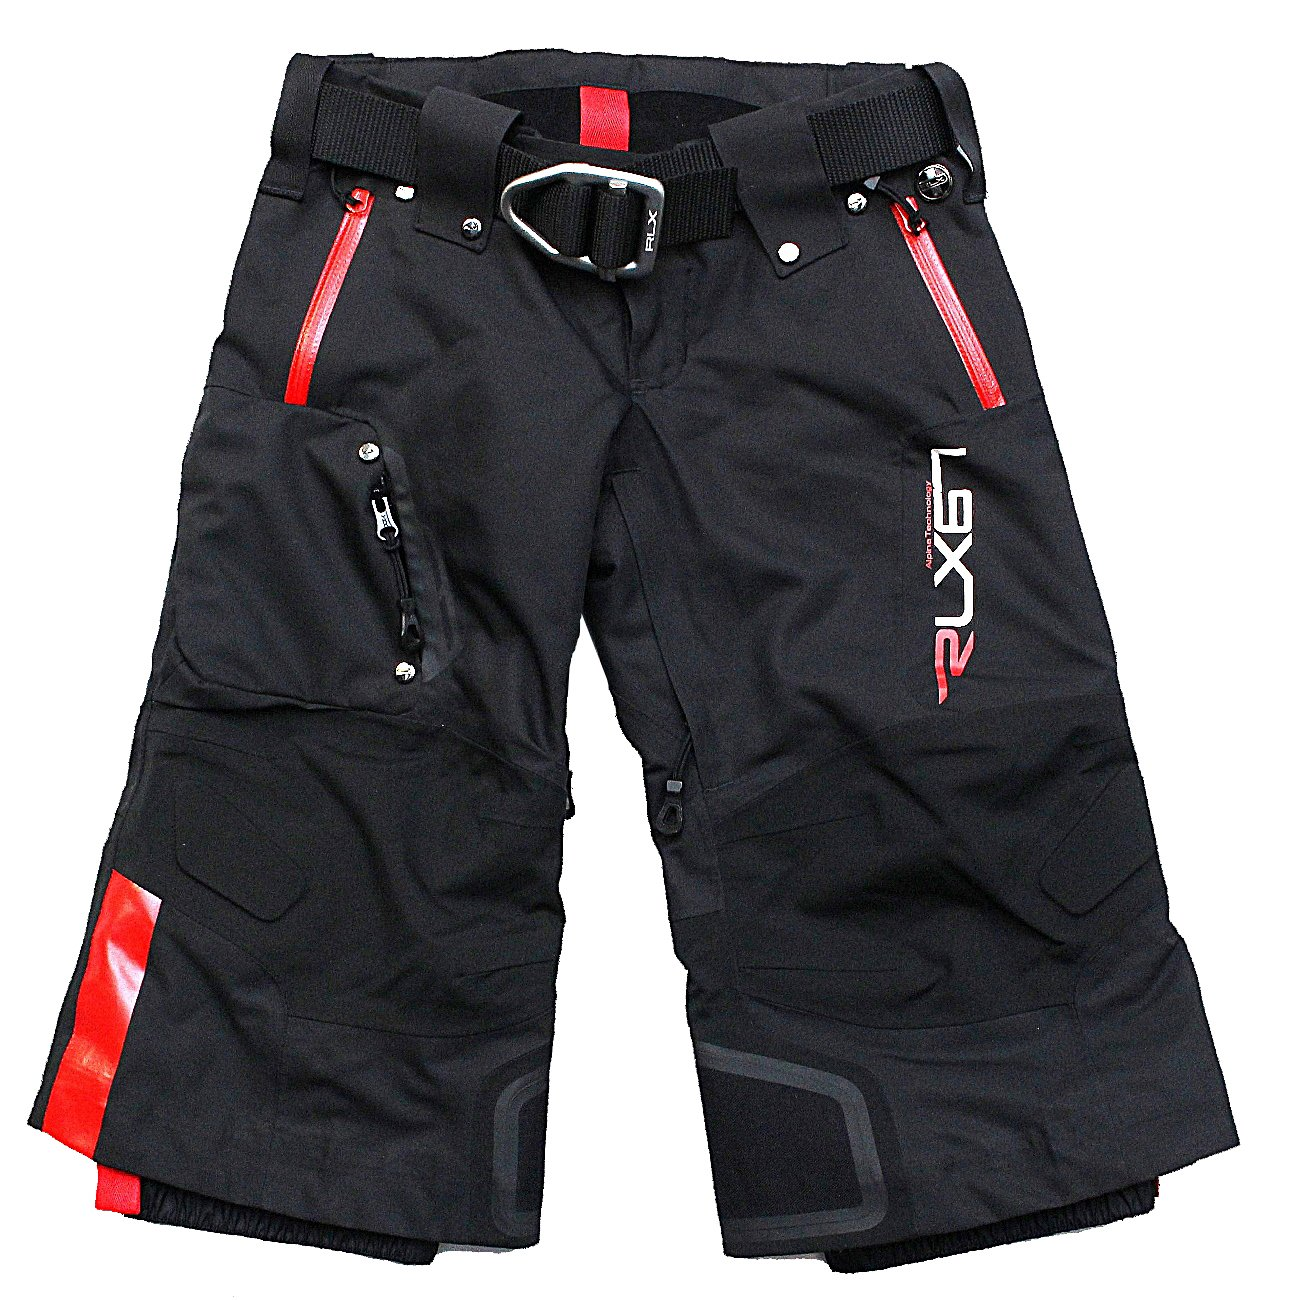 Ralph Lauren RLX Boys Black Ski and Snow Pants (Size 2/2T) by RLX